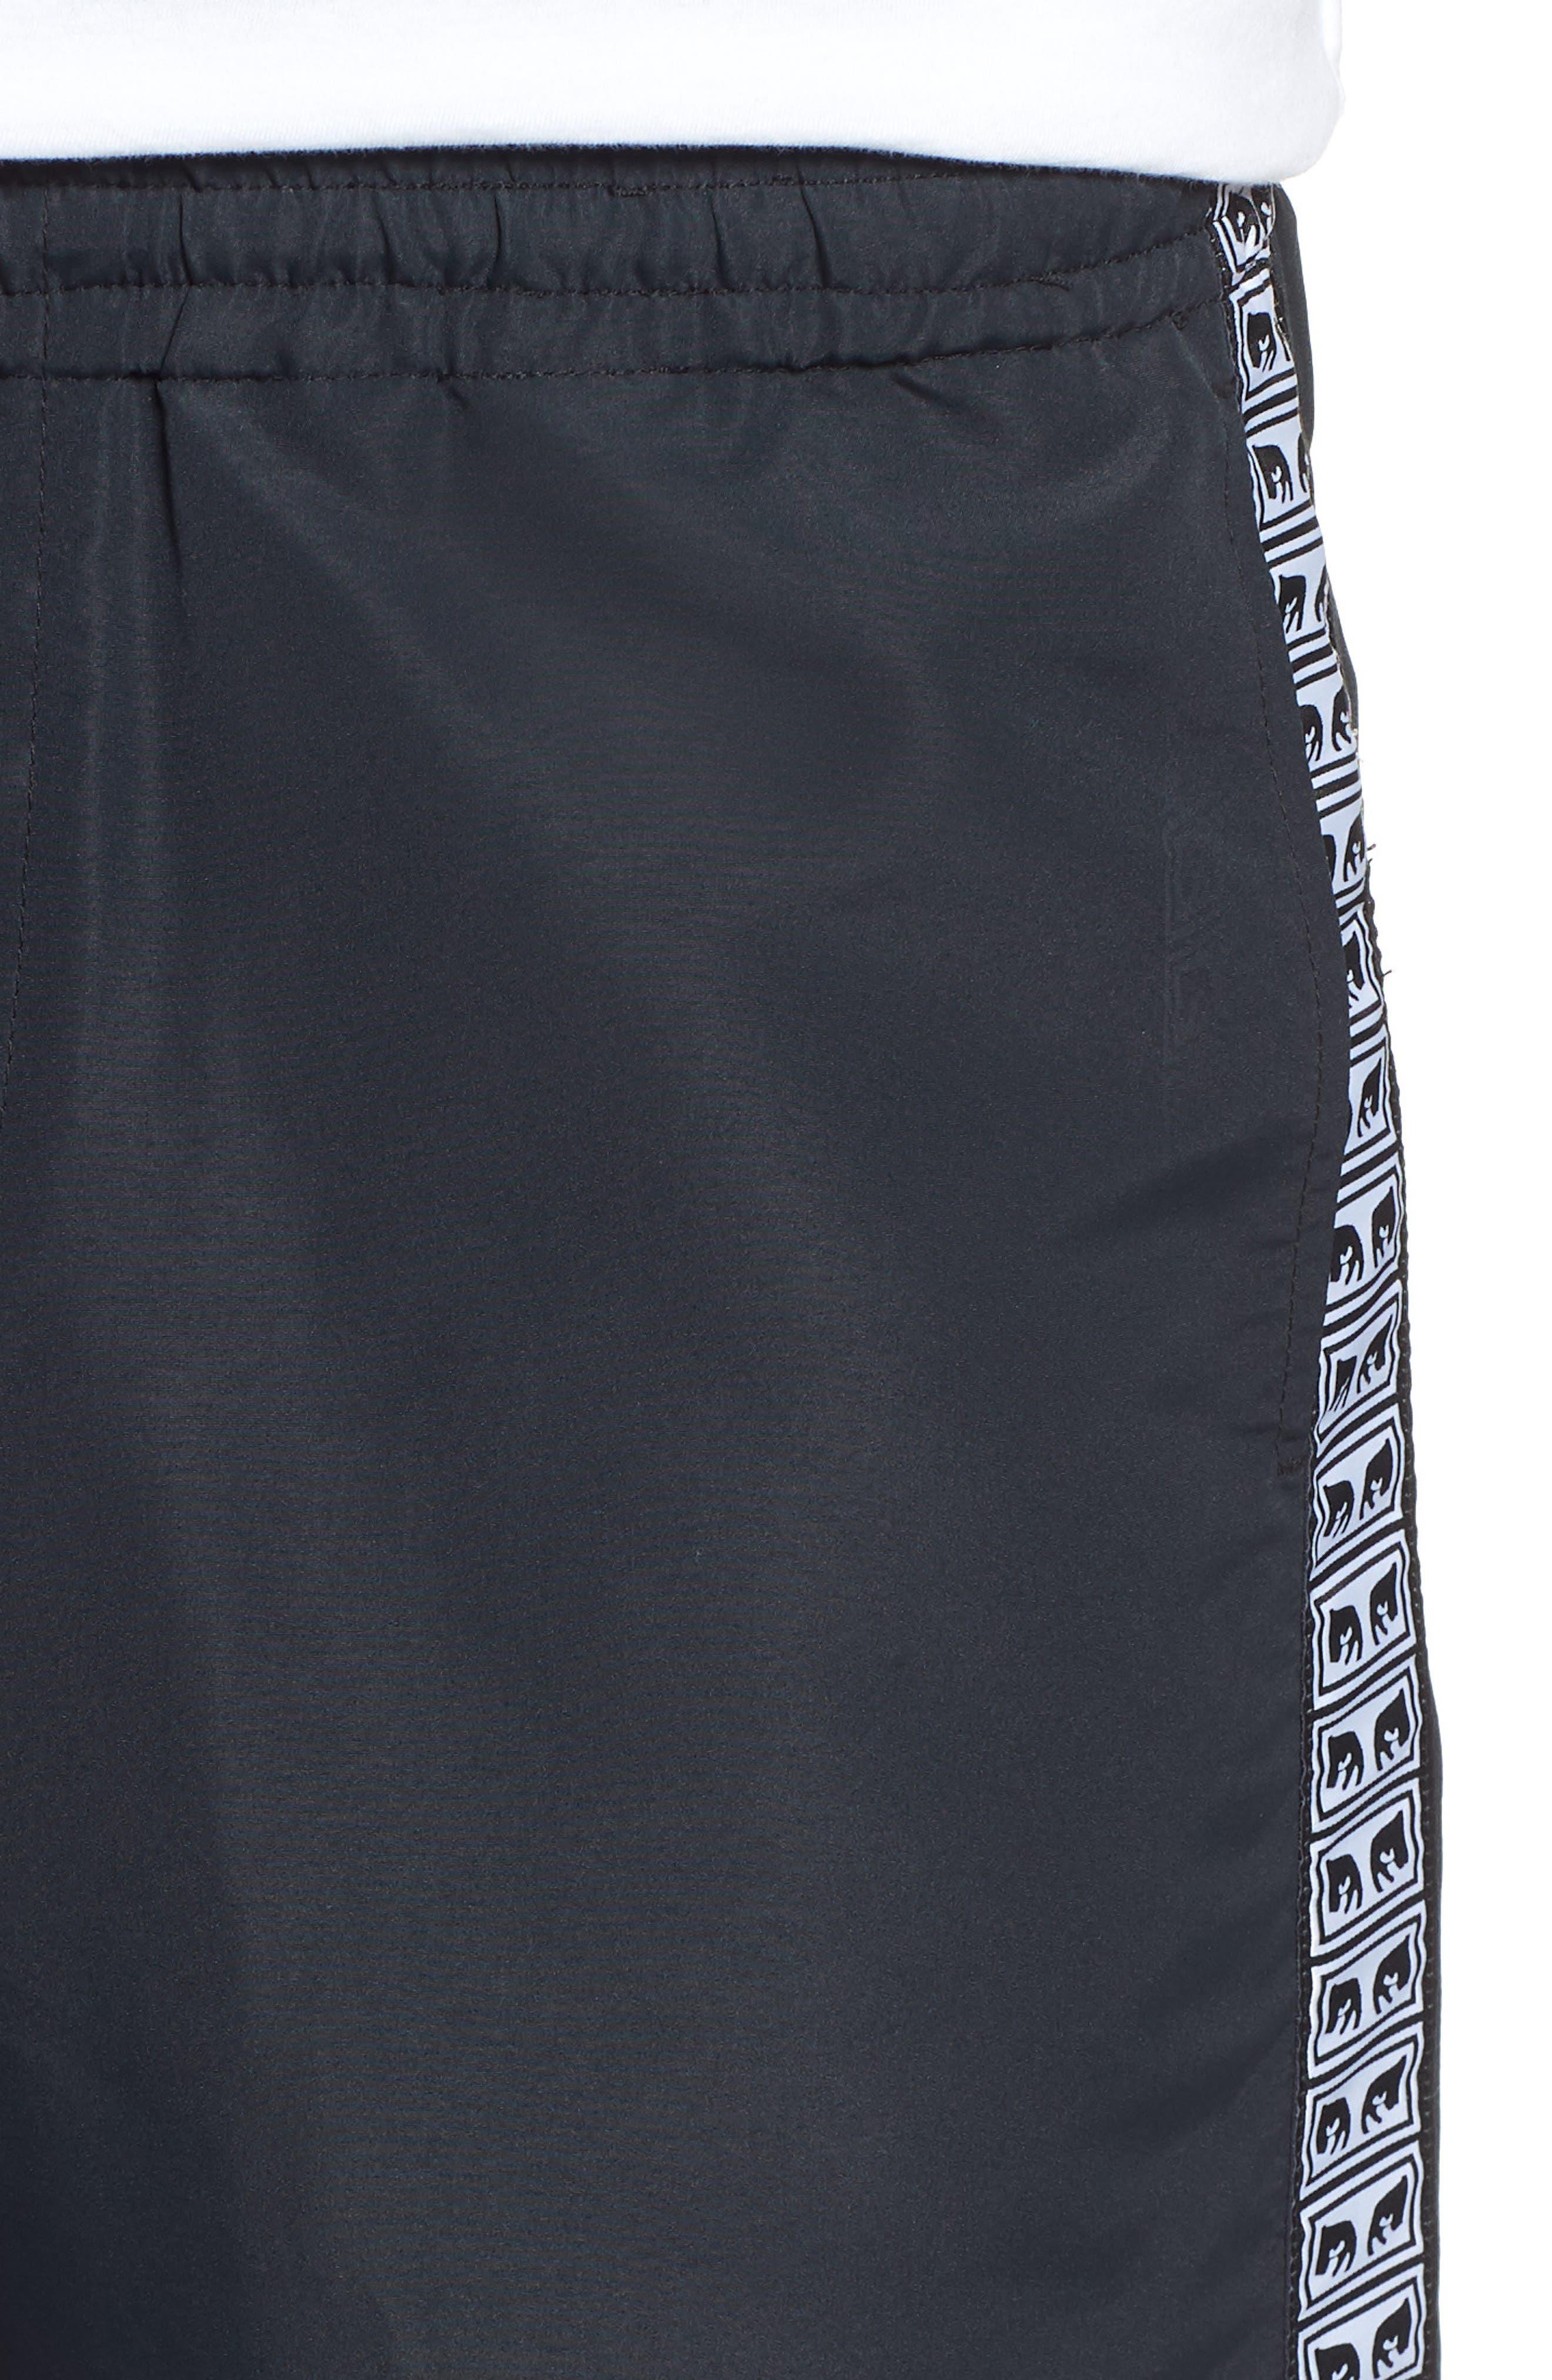 Regular Fit Eyes Taped Track Pants,                             Alternate thumbnail 4, color,                             BLACK